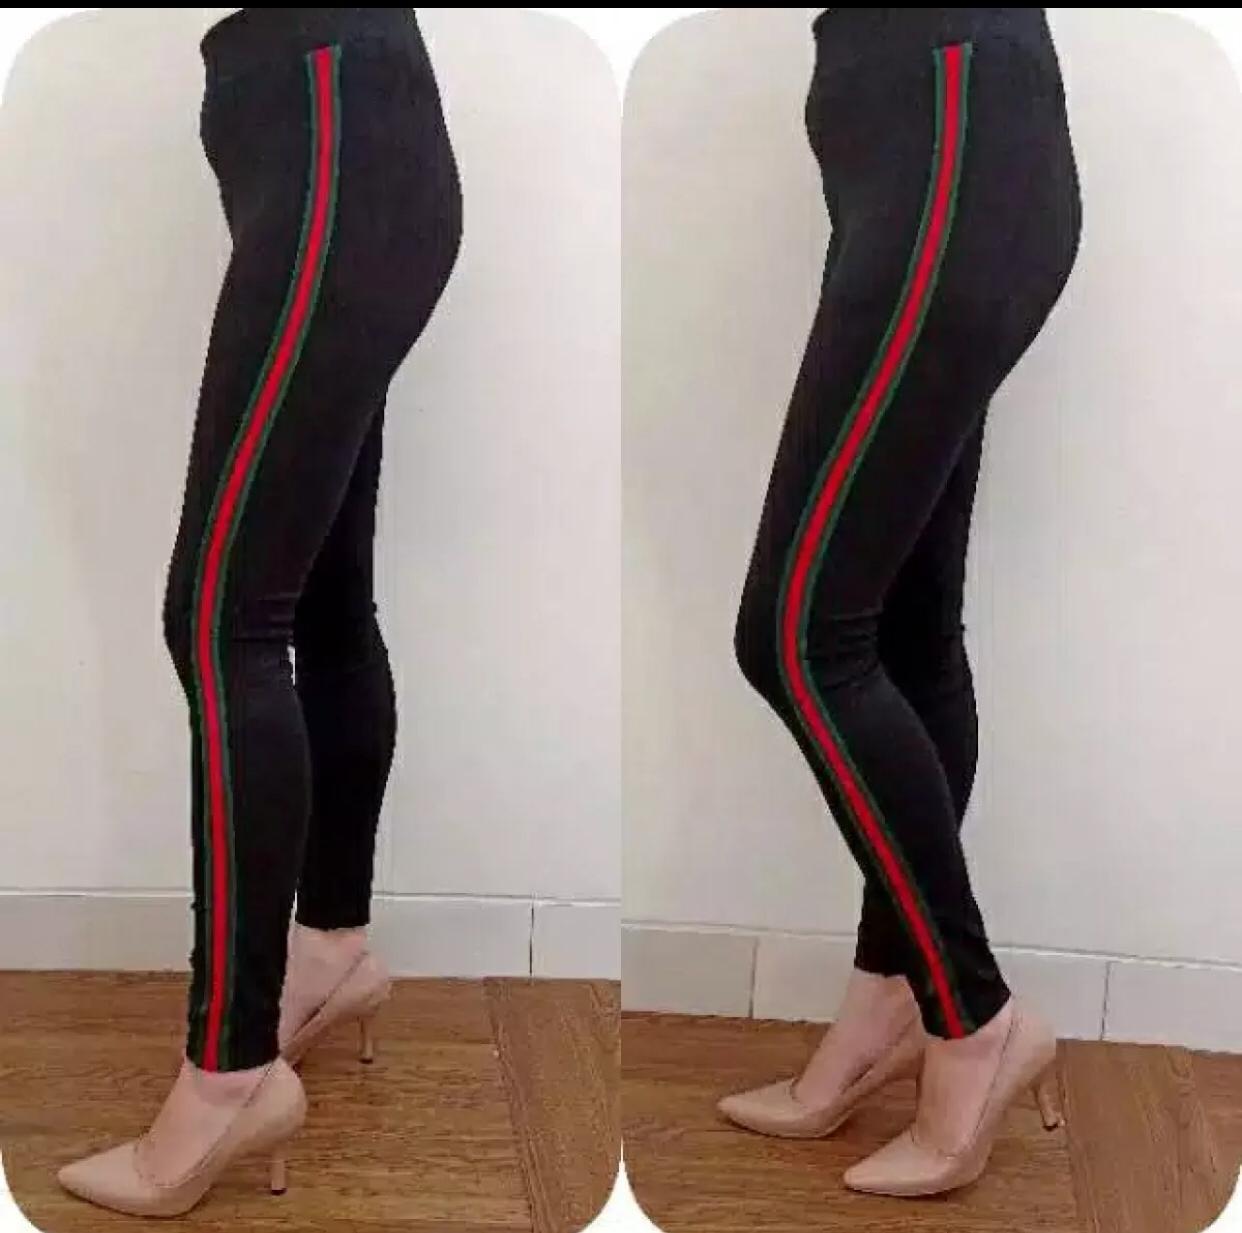 Celana Panjang Wanita Celana Santai Celana Olahraga Celana Legging Luna Bahan Scuba Lazada Indonesia